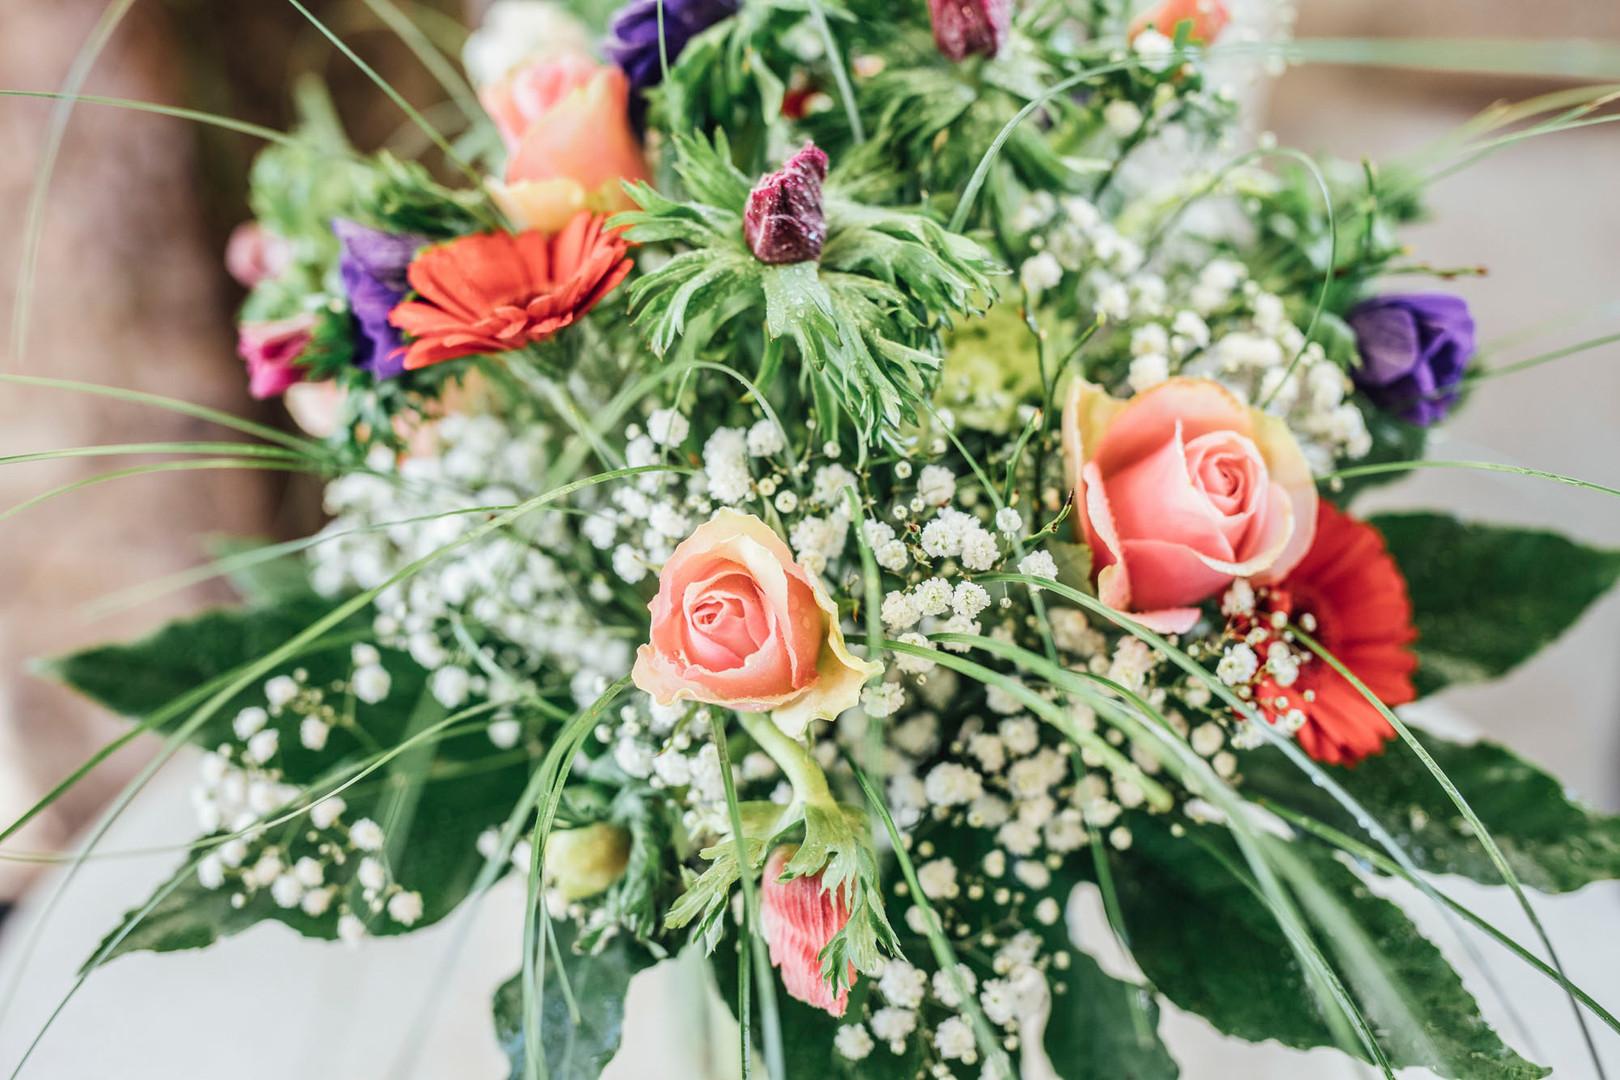 Blumen4_fs19-20.jpg